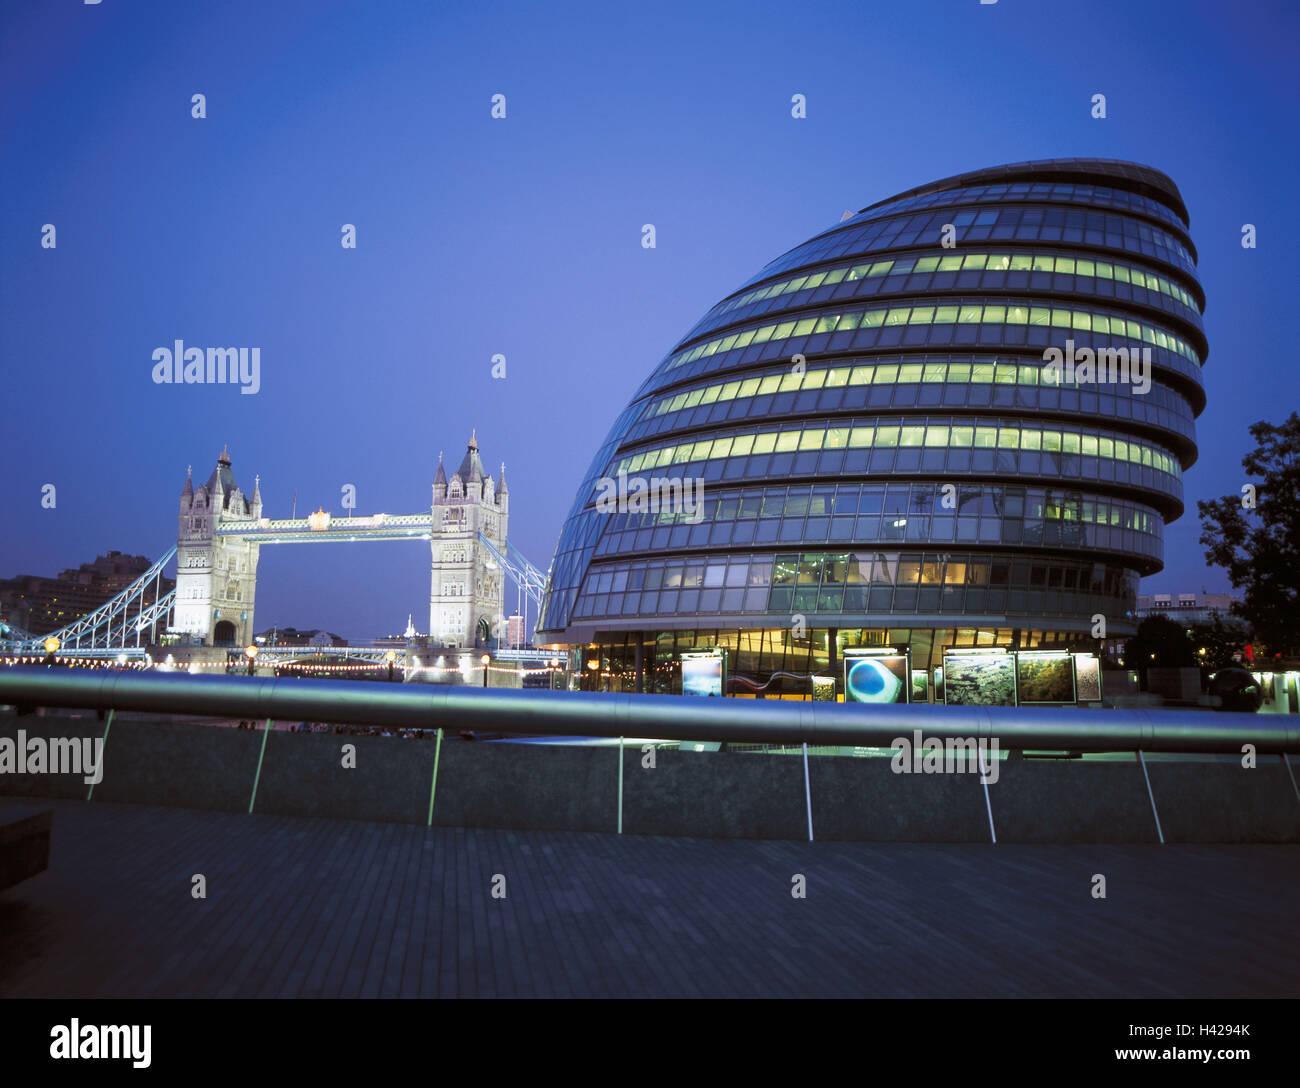 Great Britain, England, London, Tower Bridge, city sound, lighting, evening, Europe, capital, destination, place - Stock Image